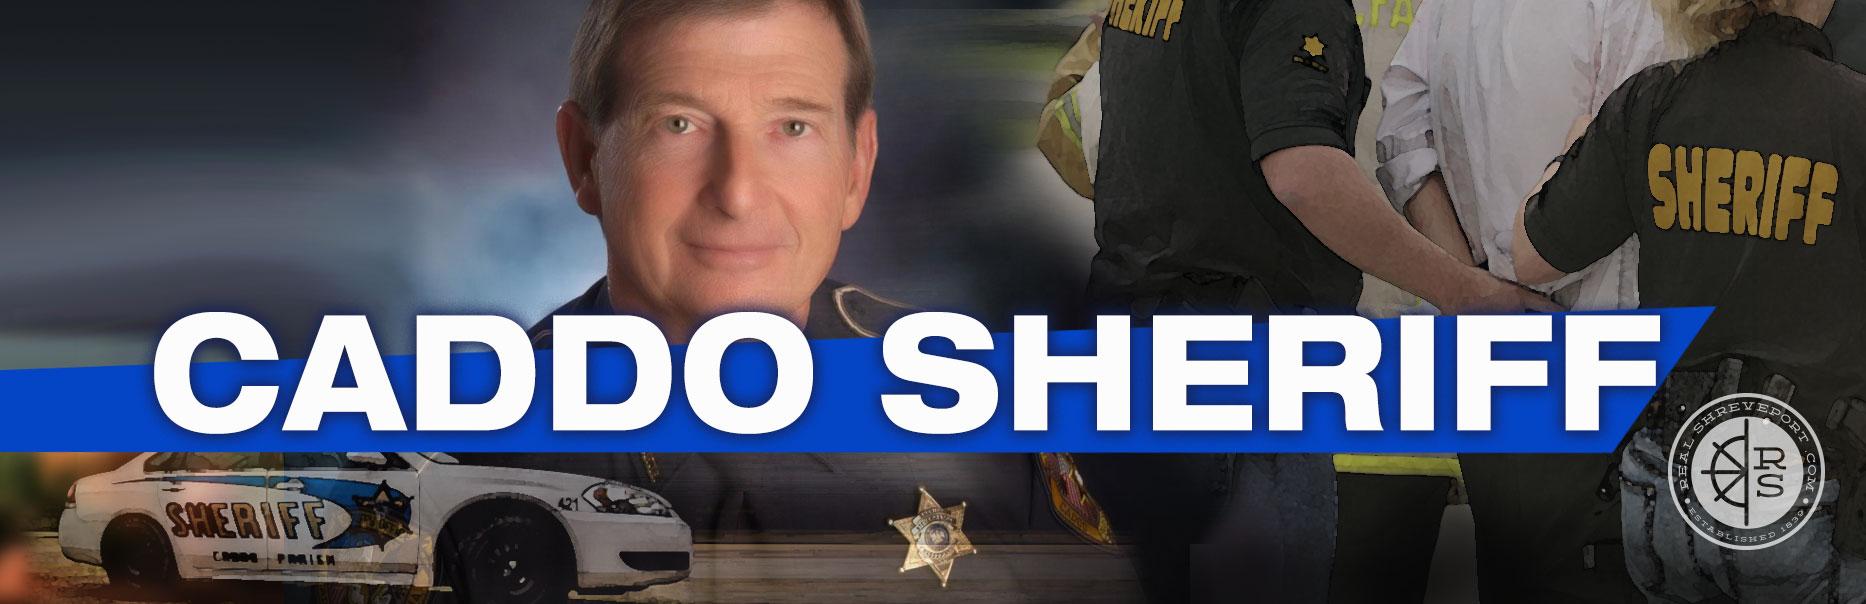 Caddo-Sheriff-Header